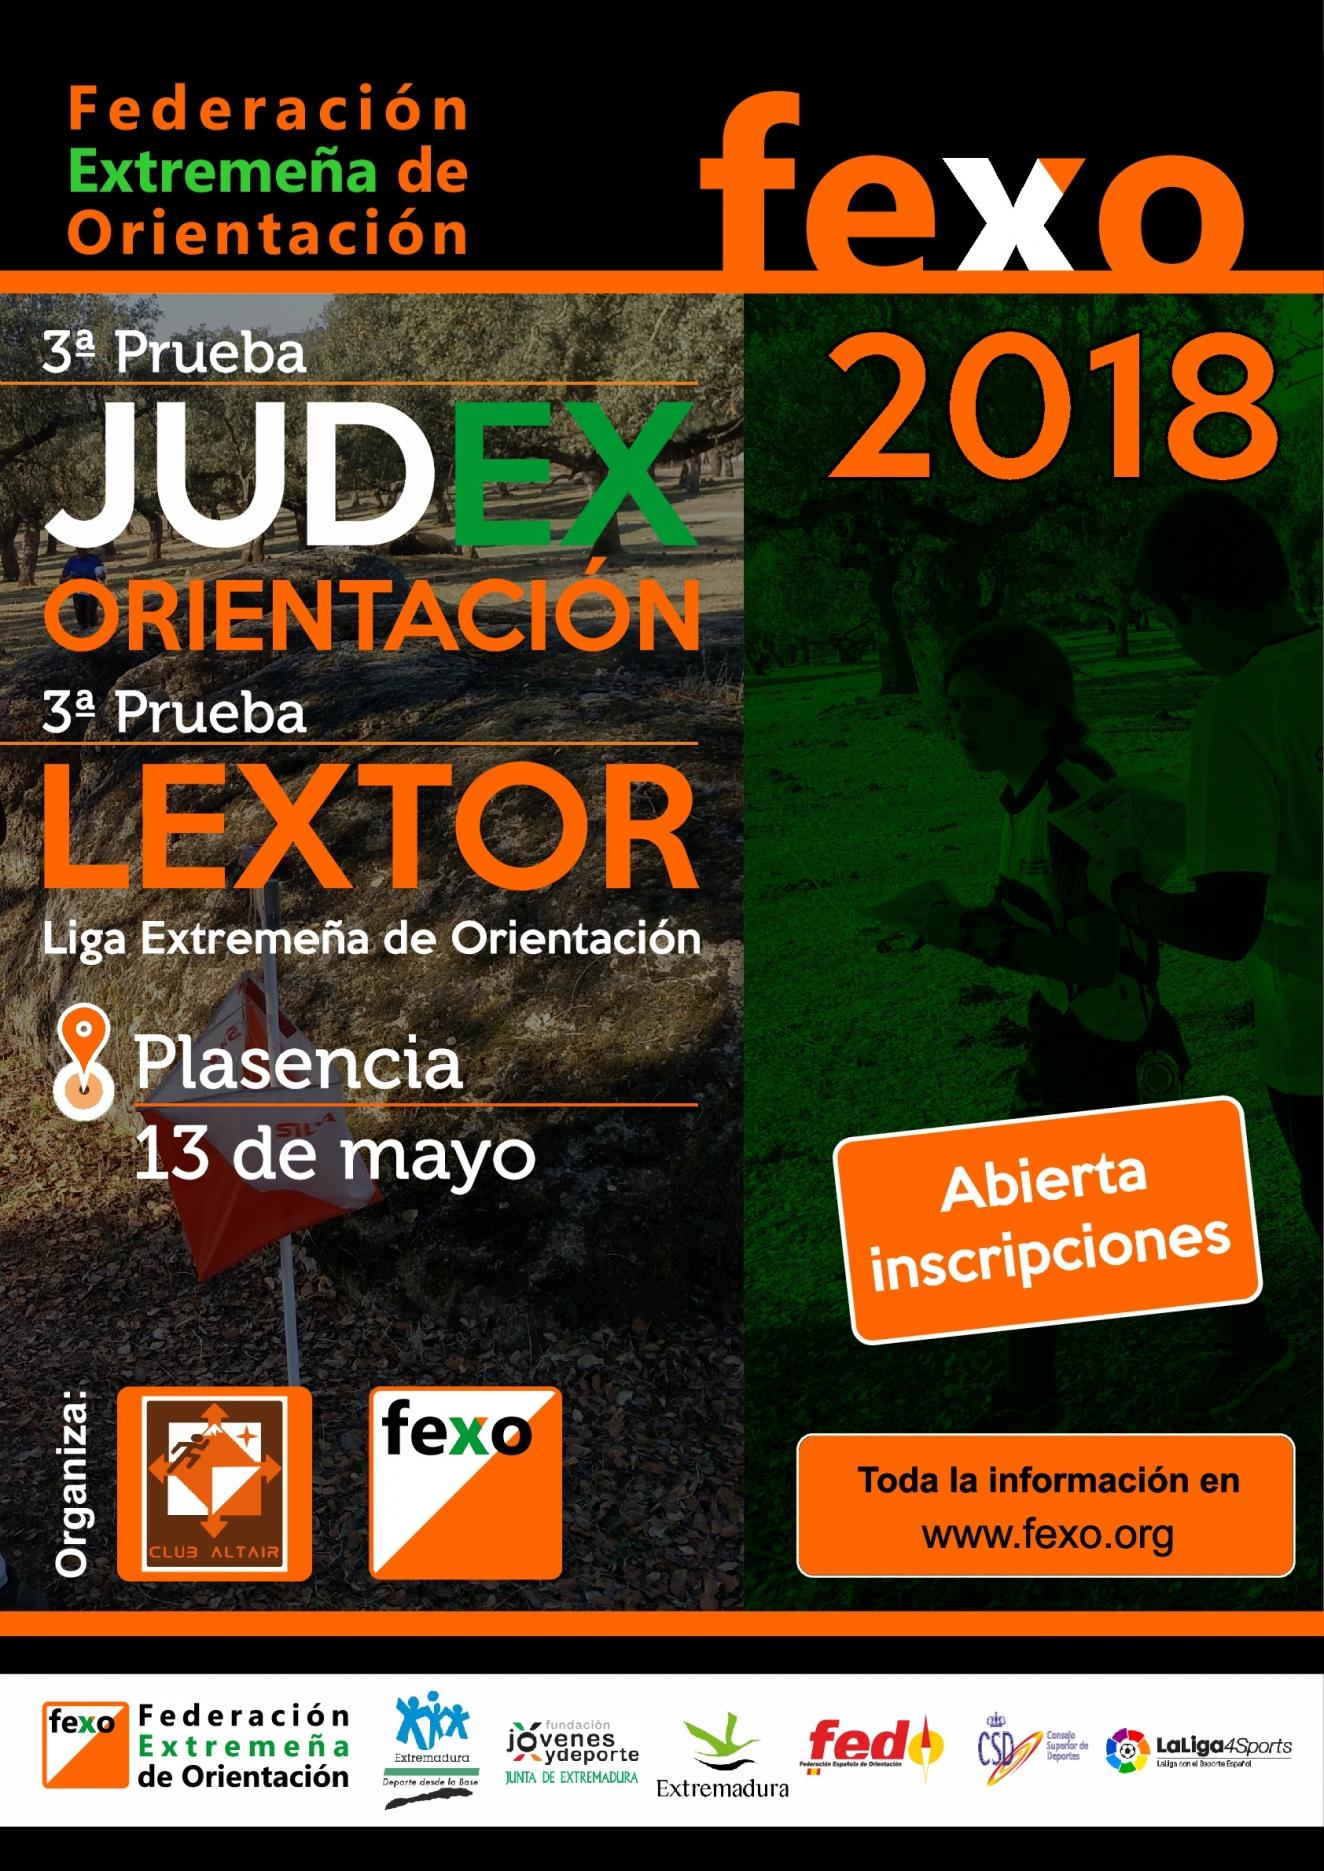 3ª Prueba Judex Lextor 2018